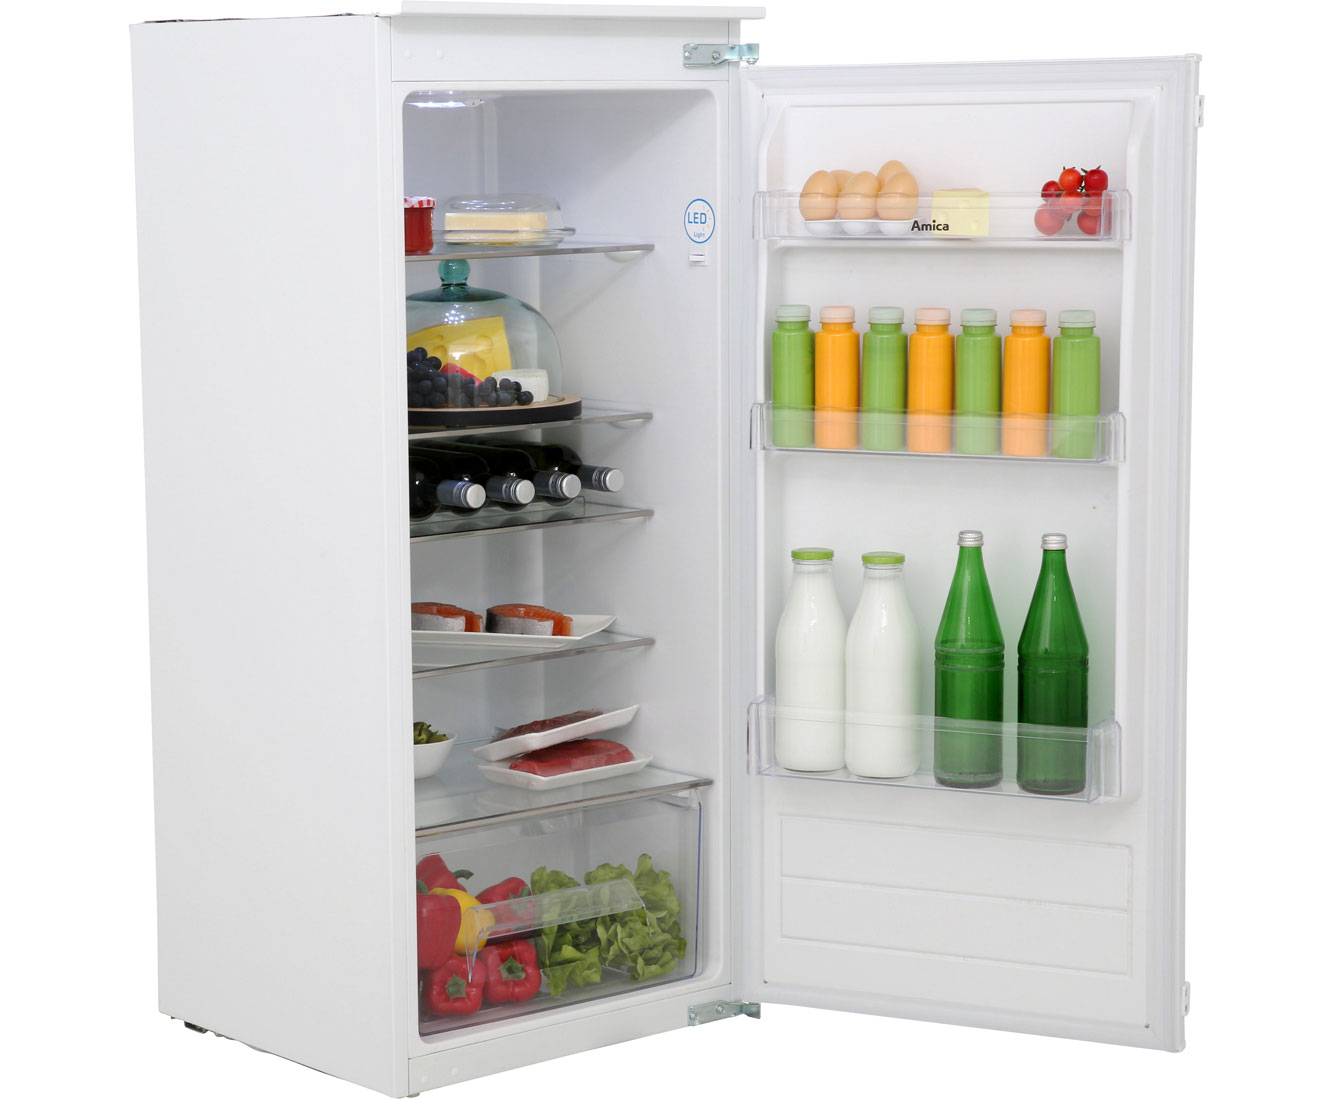 Amica EVKS 16175 Kühlschränke - Weiß